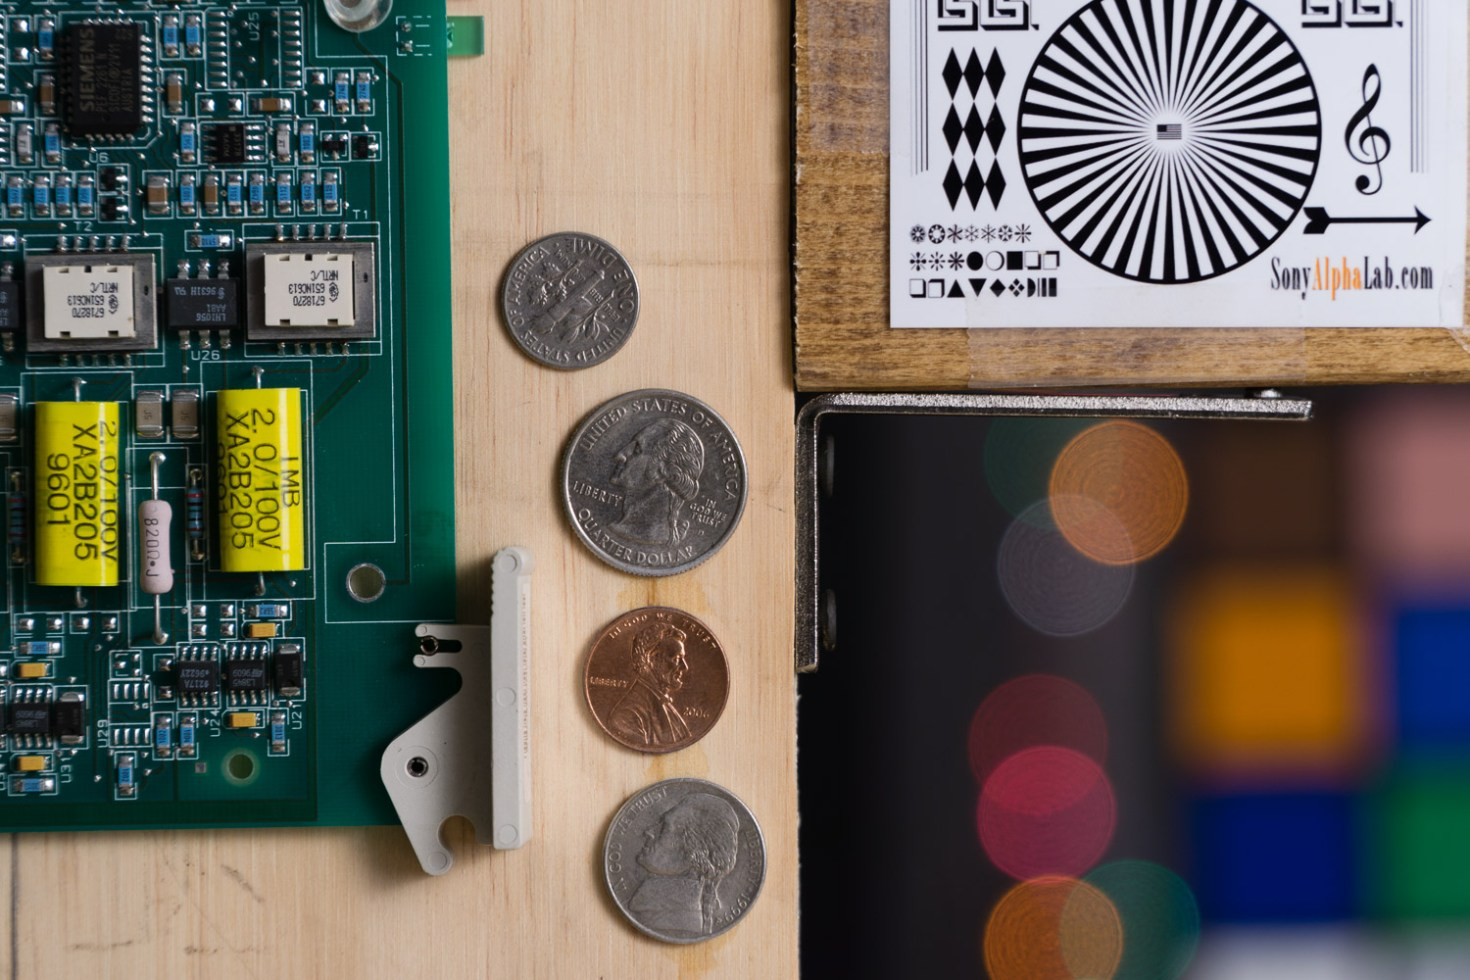 Sony A6000 w/ 18-105mm f/4 OSS G Lens @ 105mm, f/4